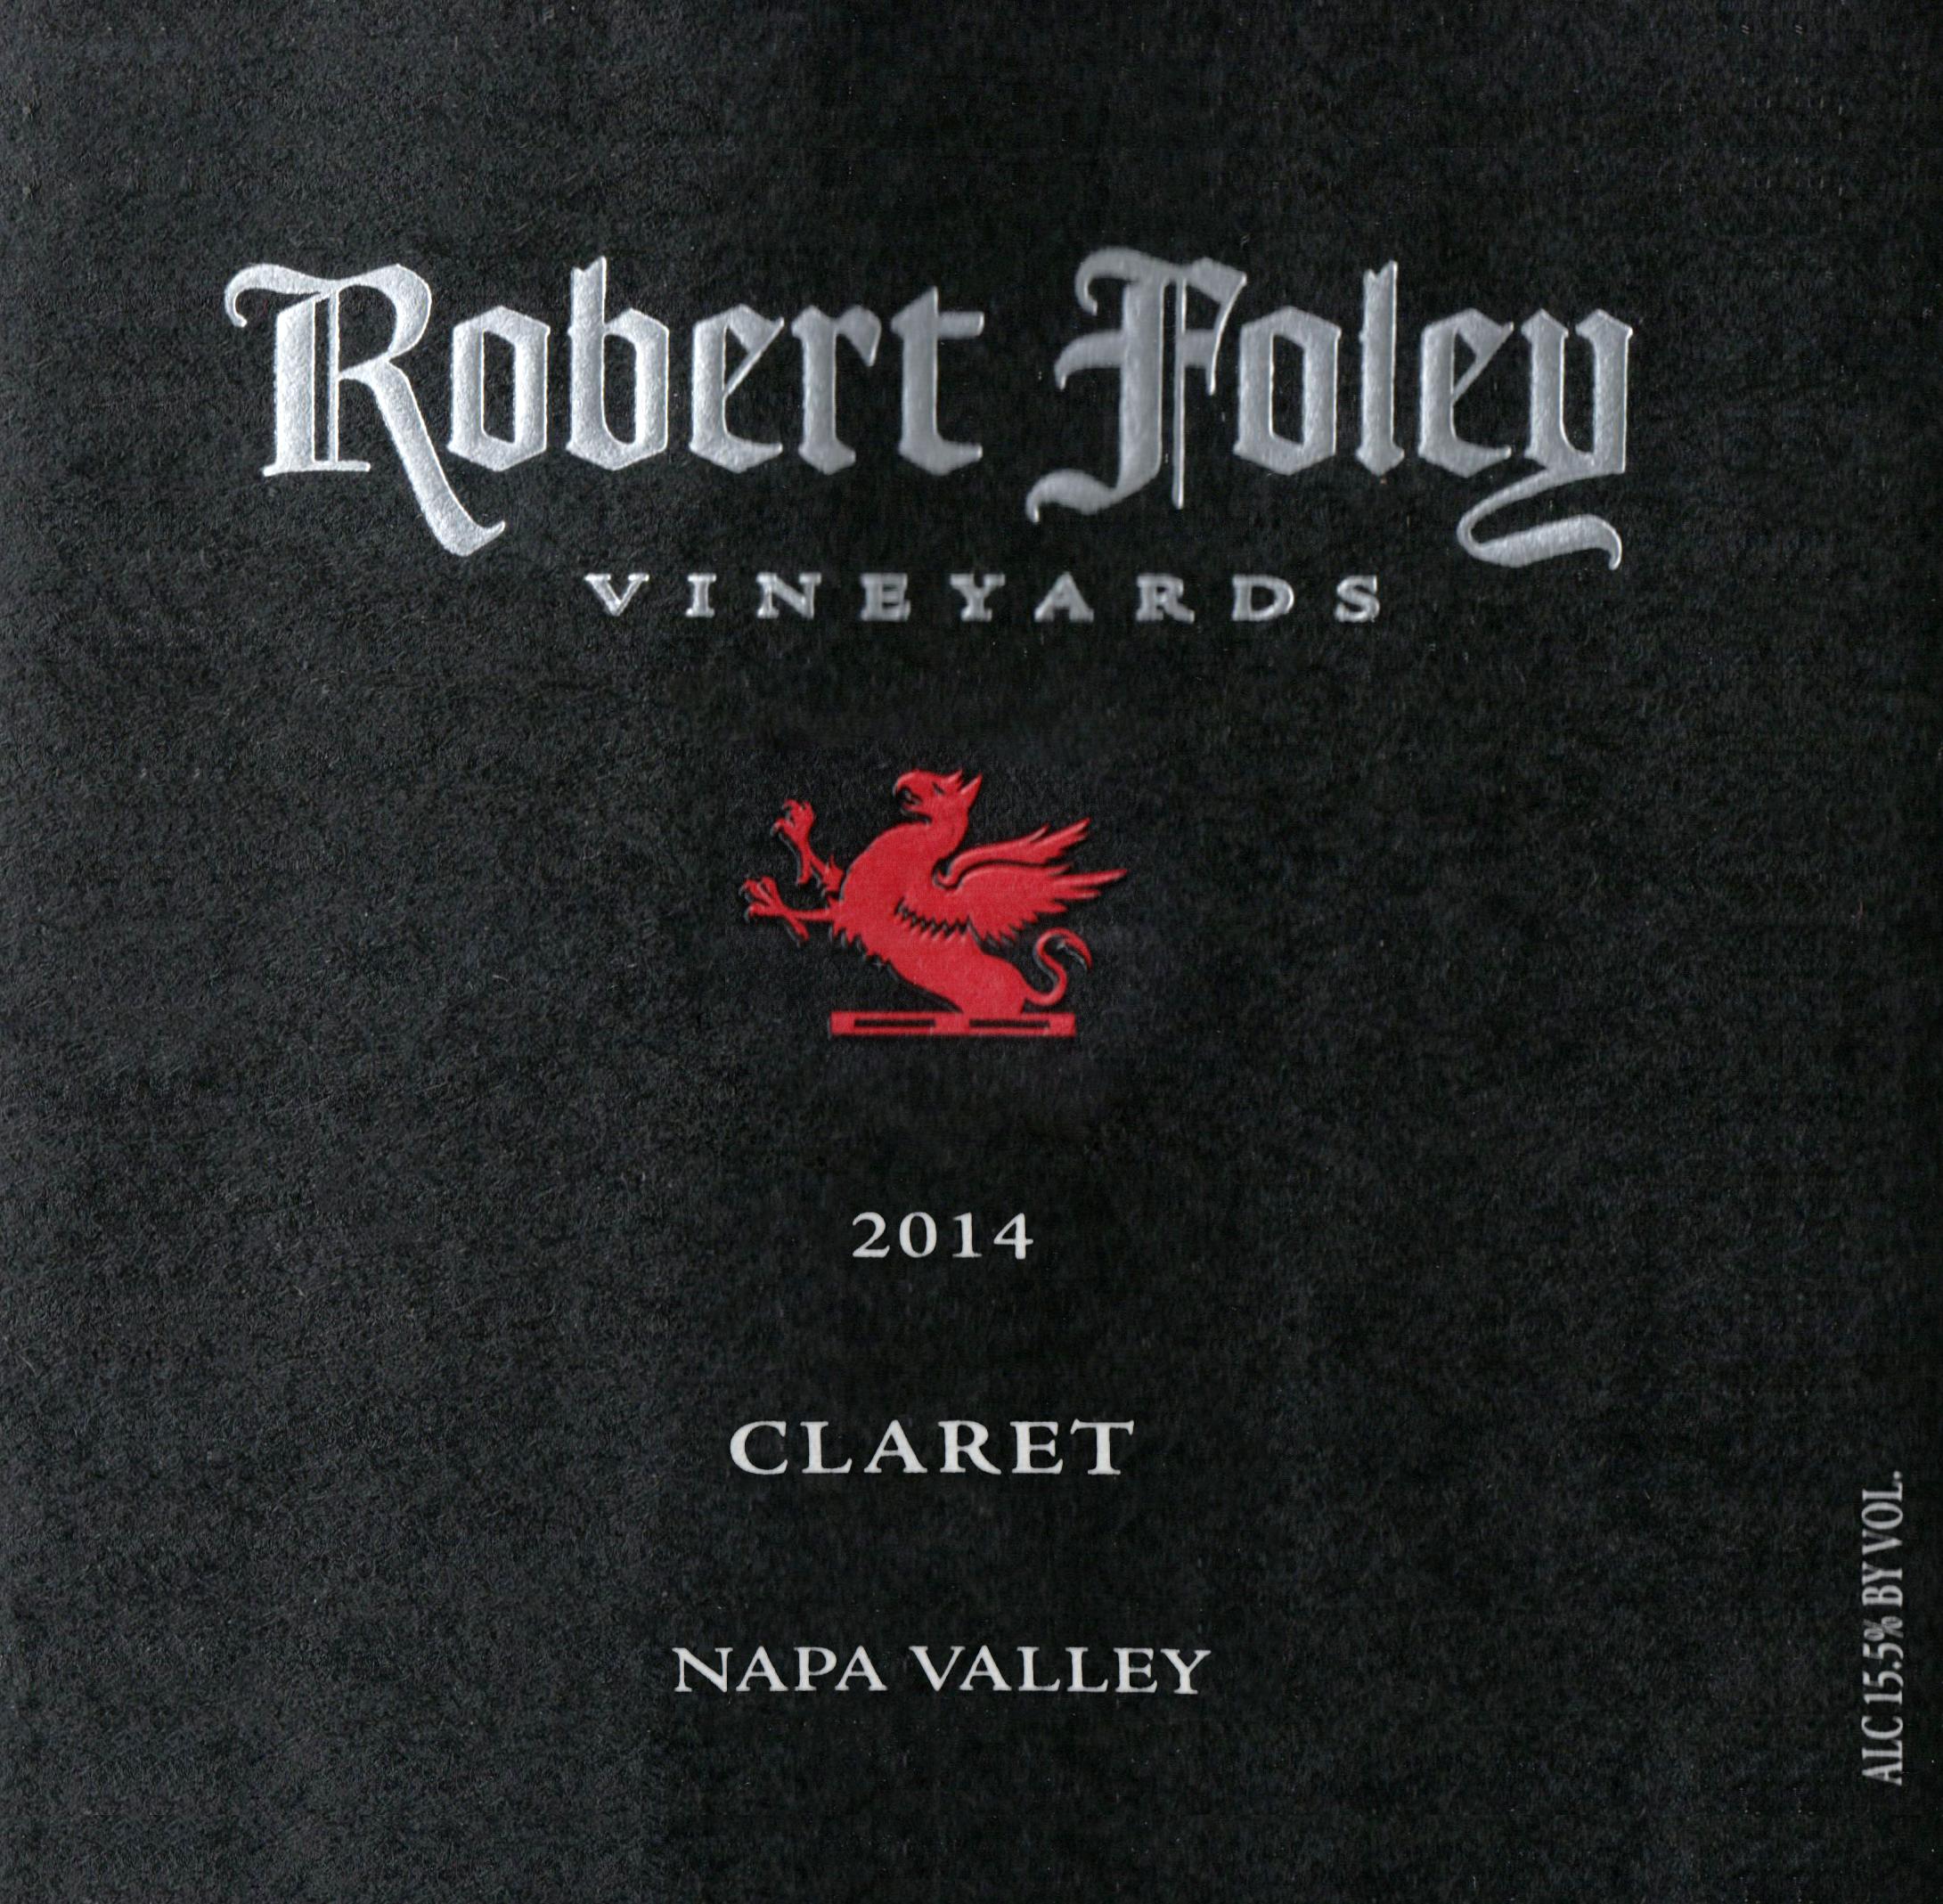 Robert Foley Vineyards Claret 2014